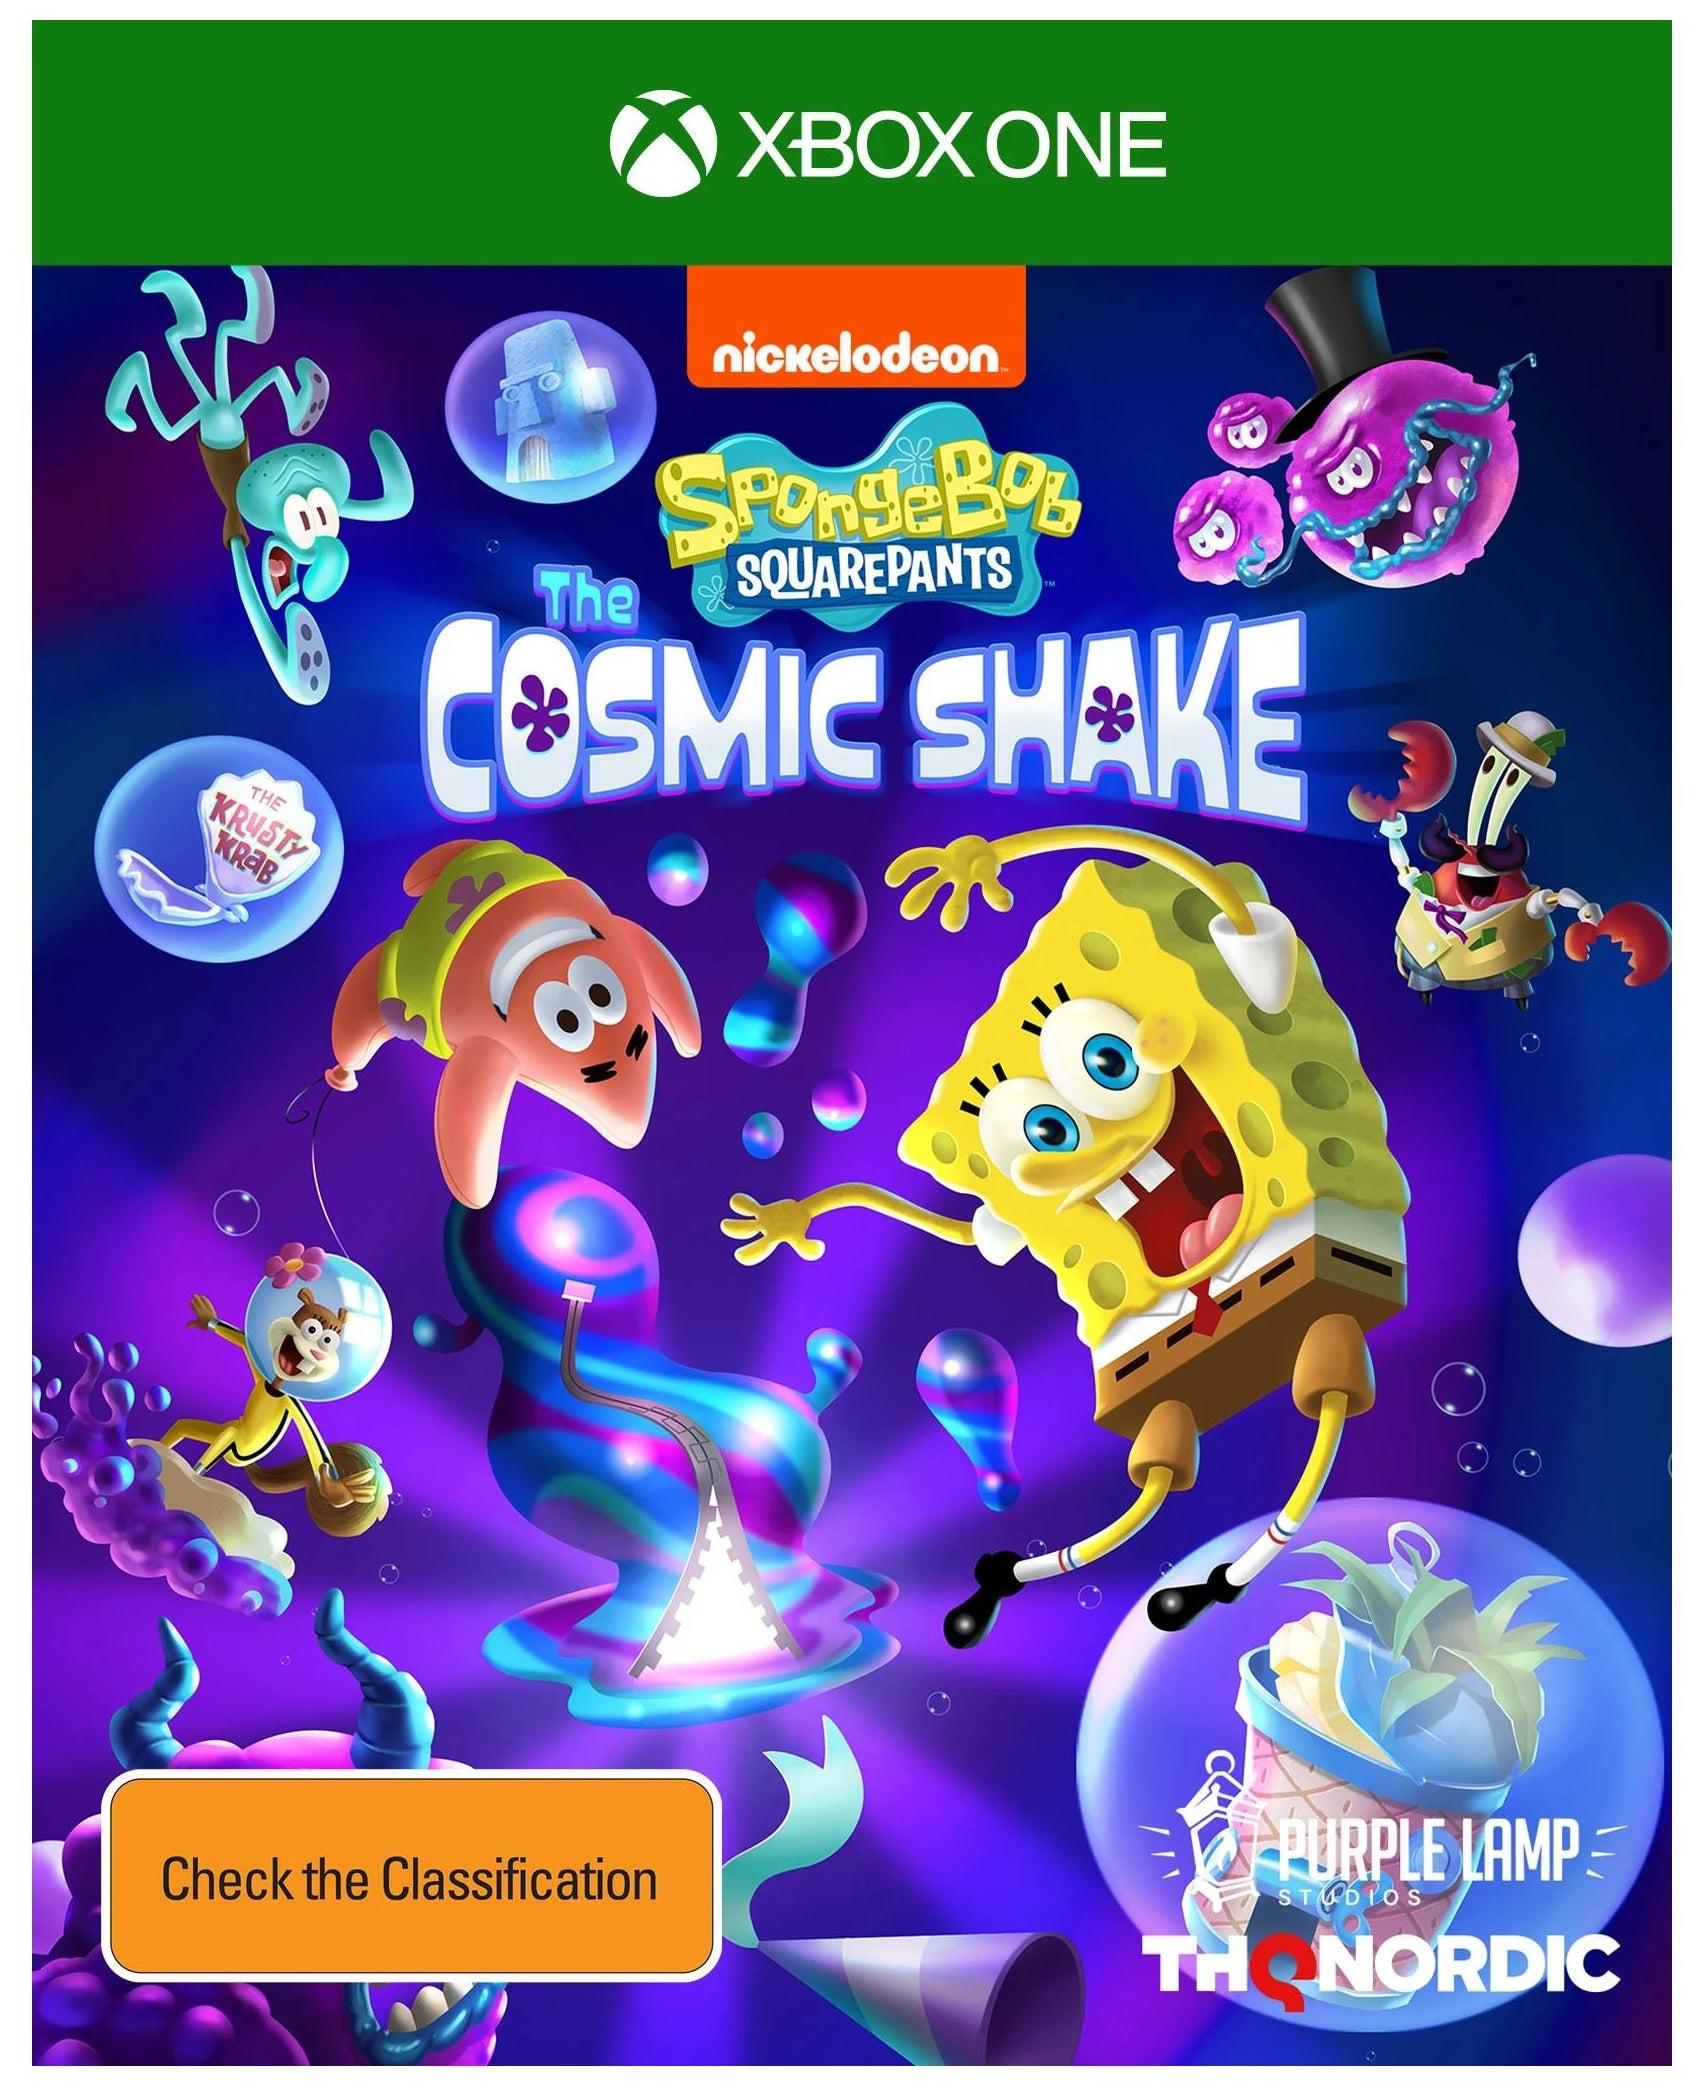 THQ SpongeBob SquarePants The Cosmic Shake Xbox One Game